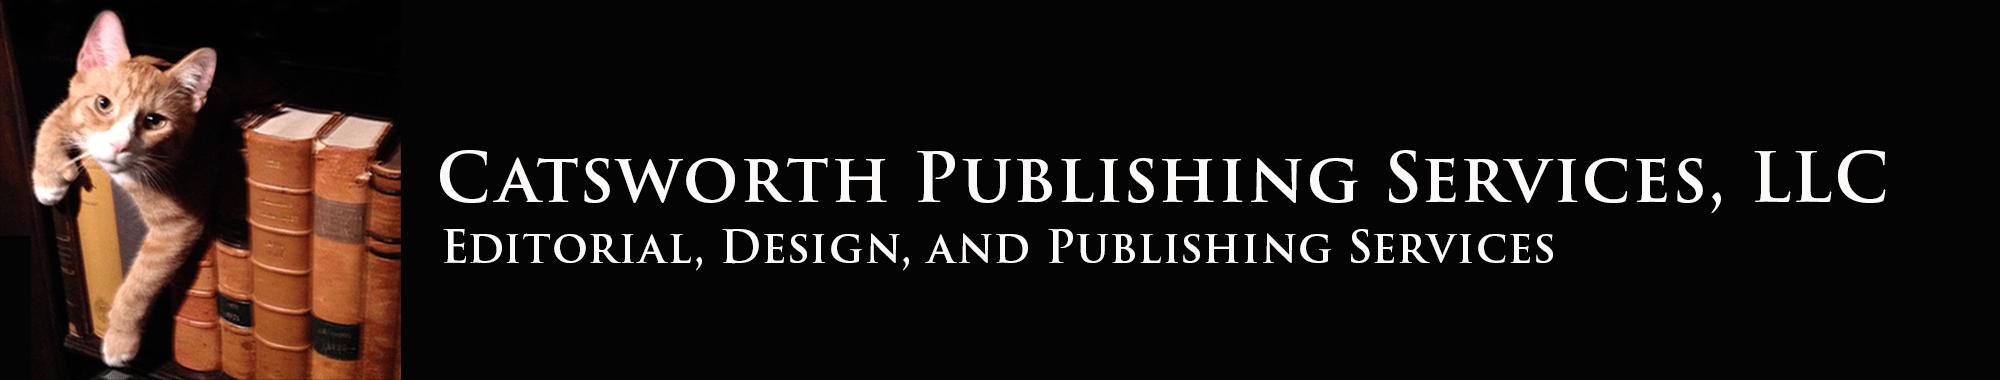 Catsworth Publishing Services, LLC